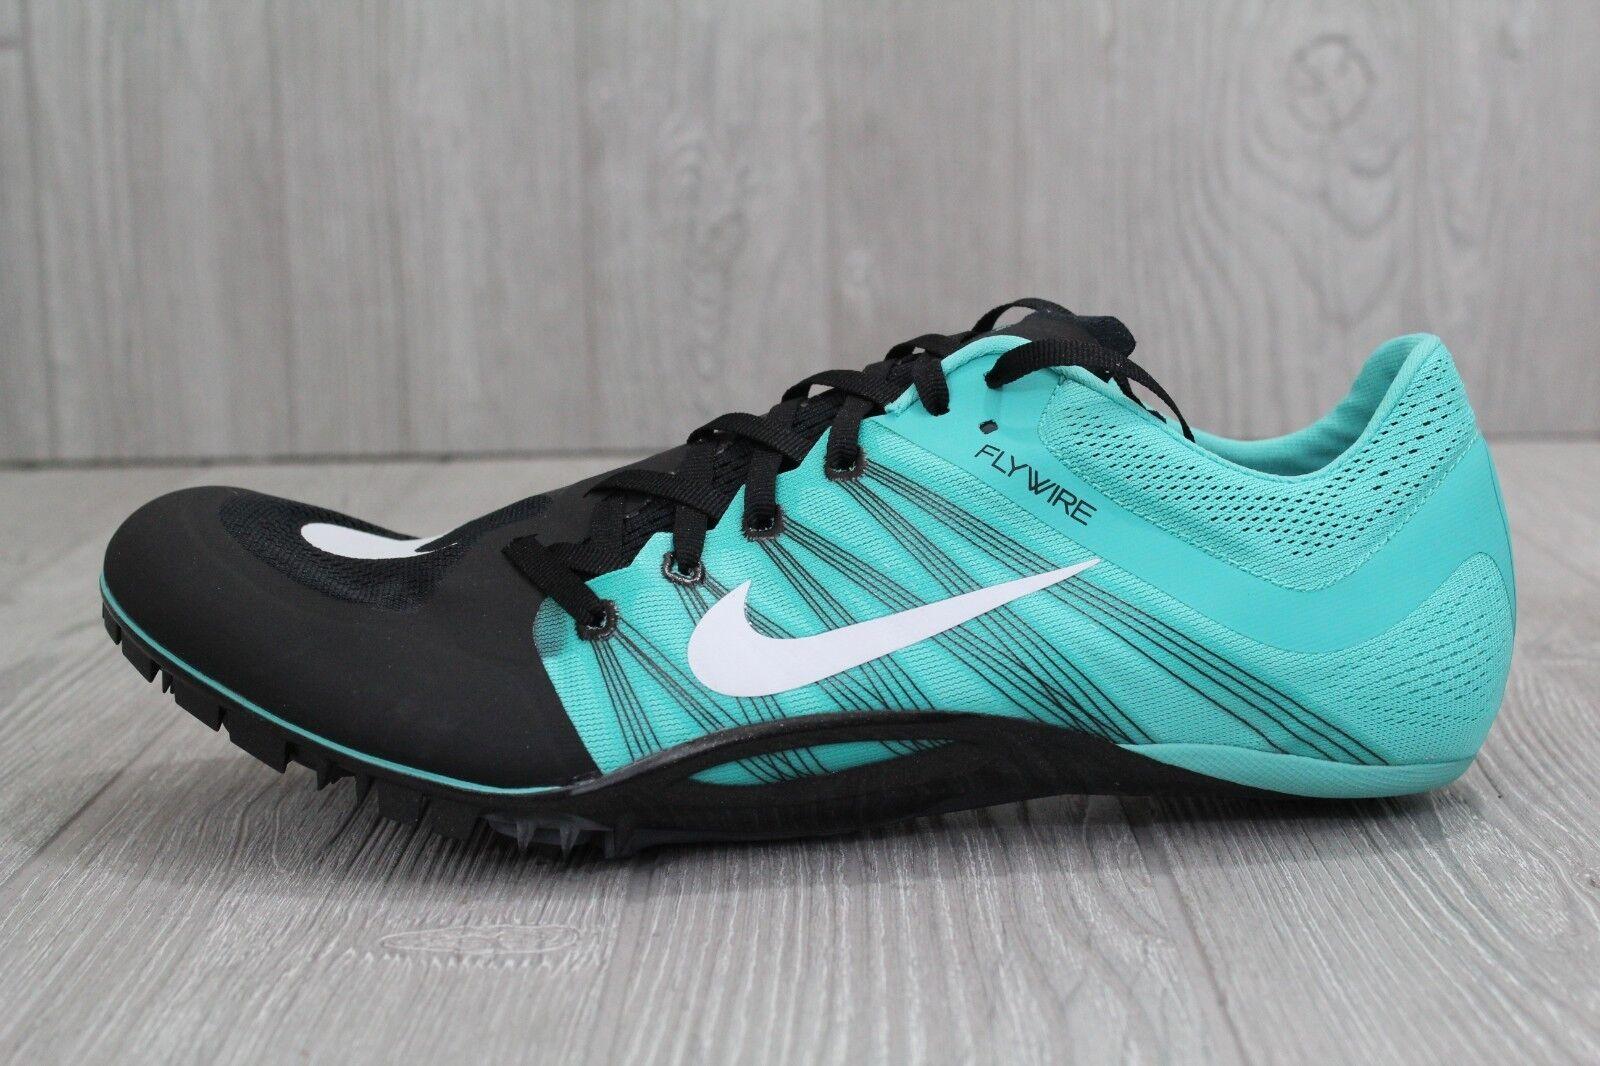 6ac03c01e75e 30 New Nike Zoom Ja Fly 2 2 2 Mens Cleats Track Spikes 705373-013 ...